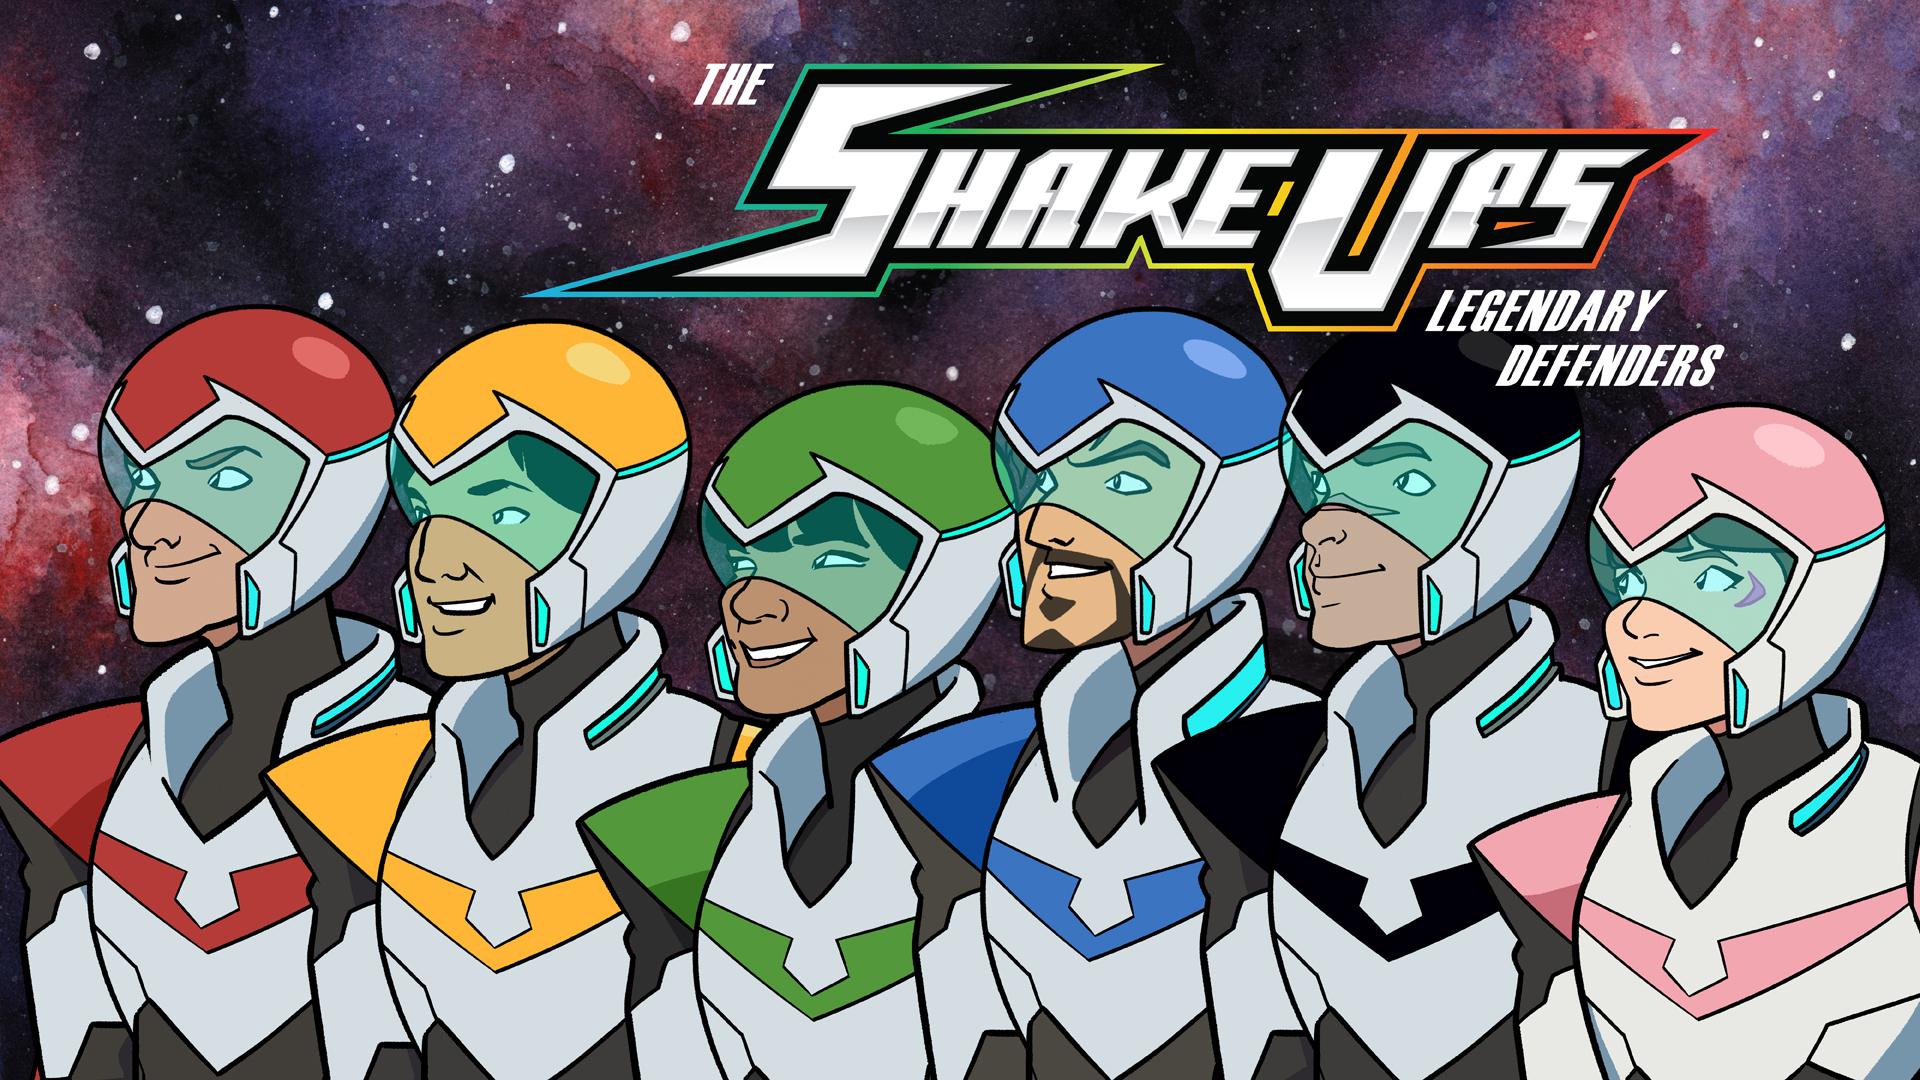 Shake Ups Legendary Defenders Paladins.jpg